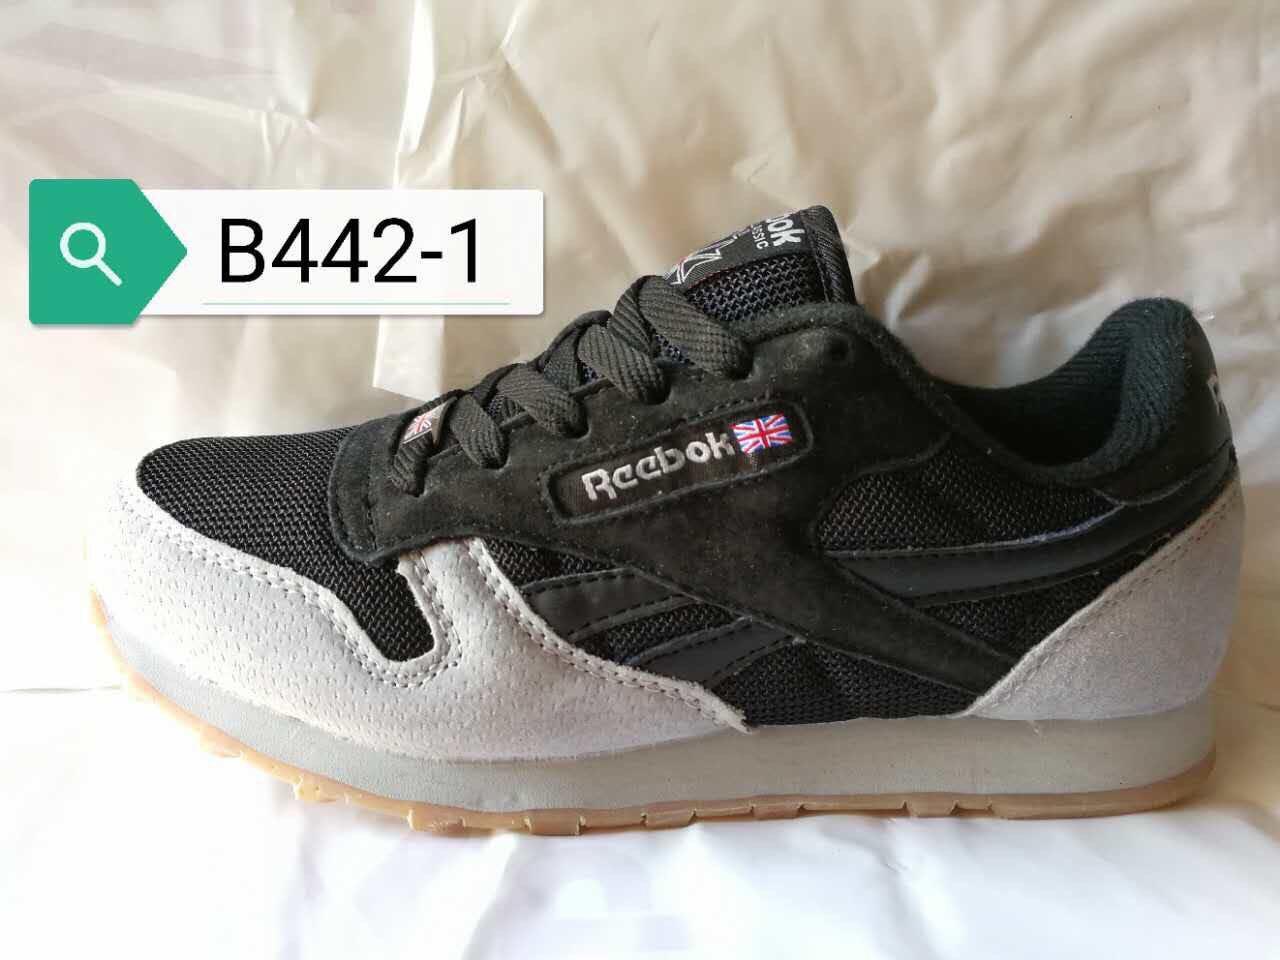 8f4845a1f430 Кроссовки подросток Reebok Classic (36-41), цена 524 грн., купить в ...